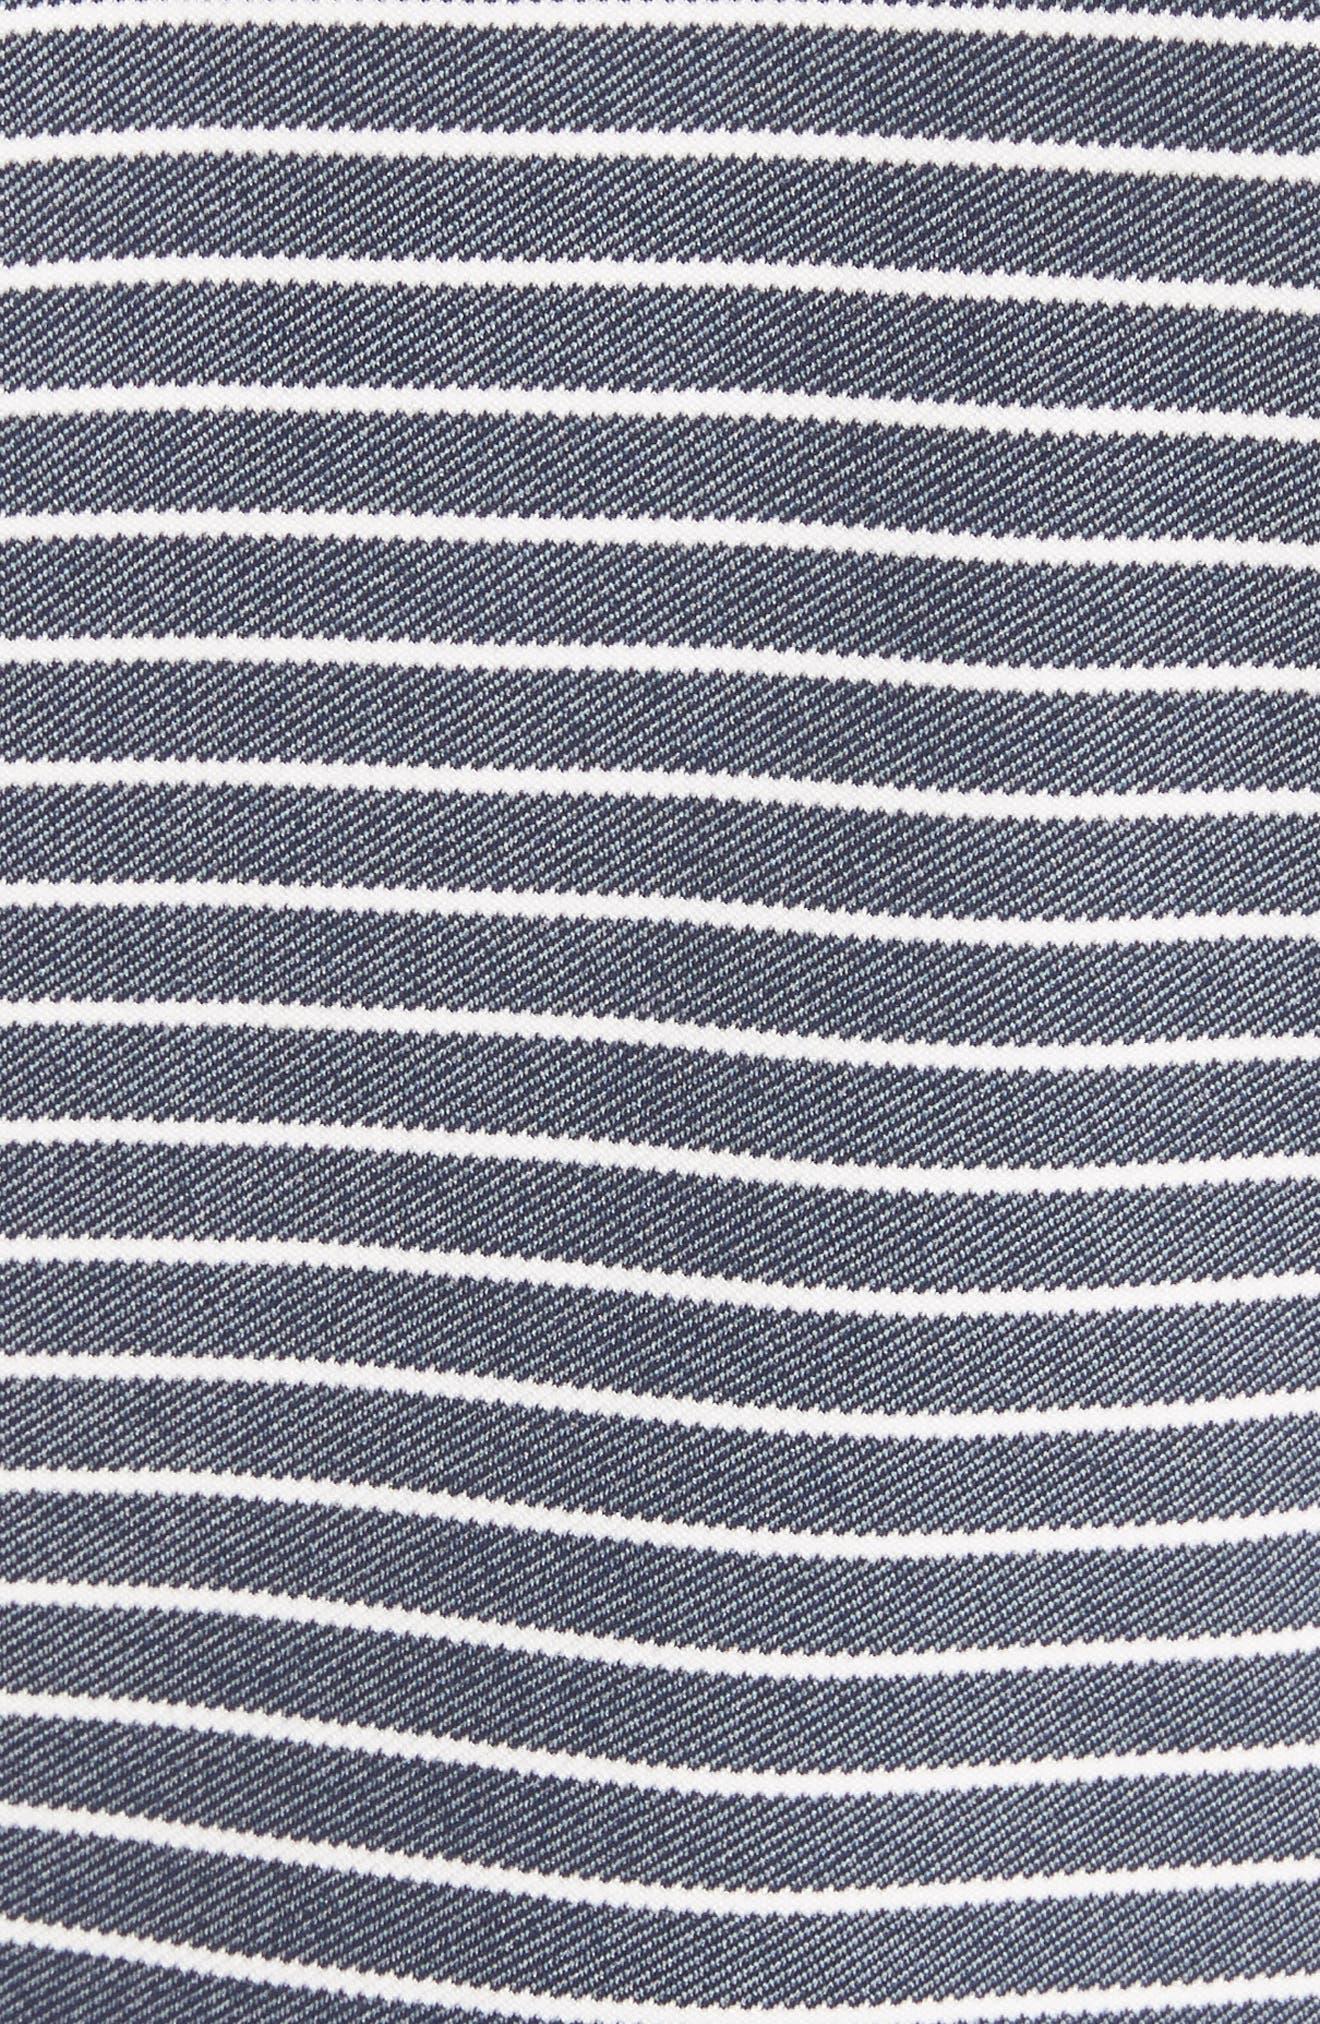 Julius Stripe Denim Twill Jacket,                             Alternate thumbnail 6, color,                             435